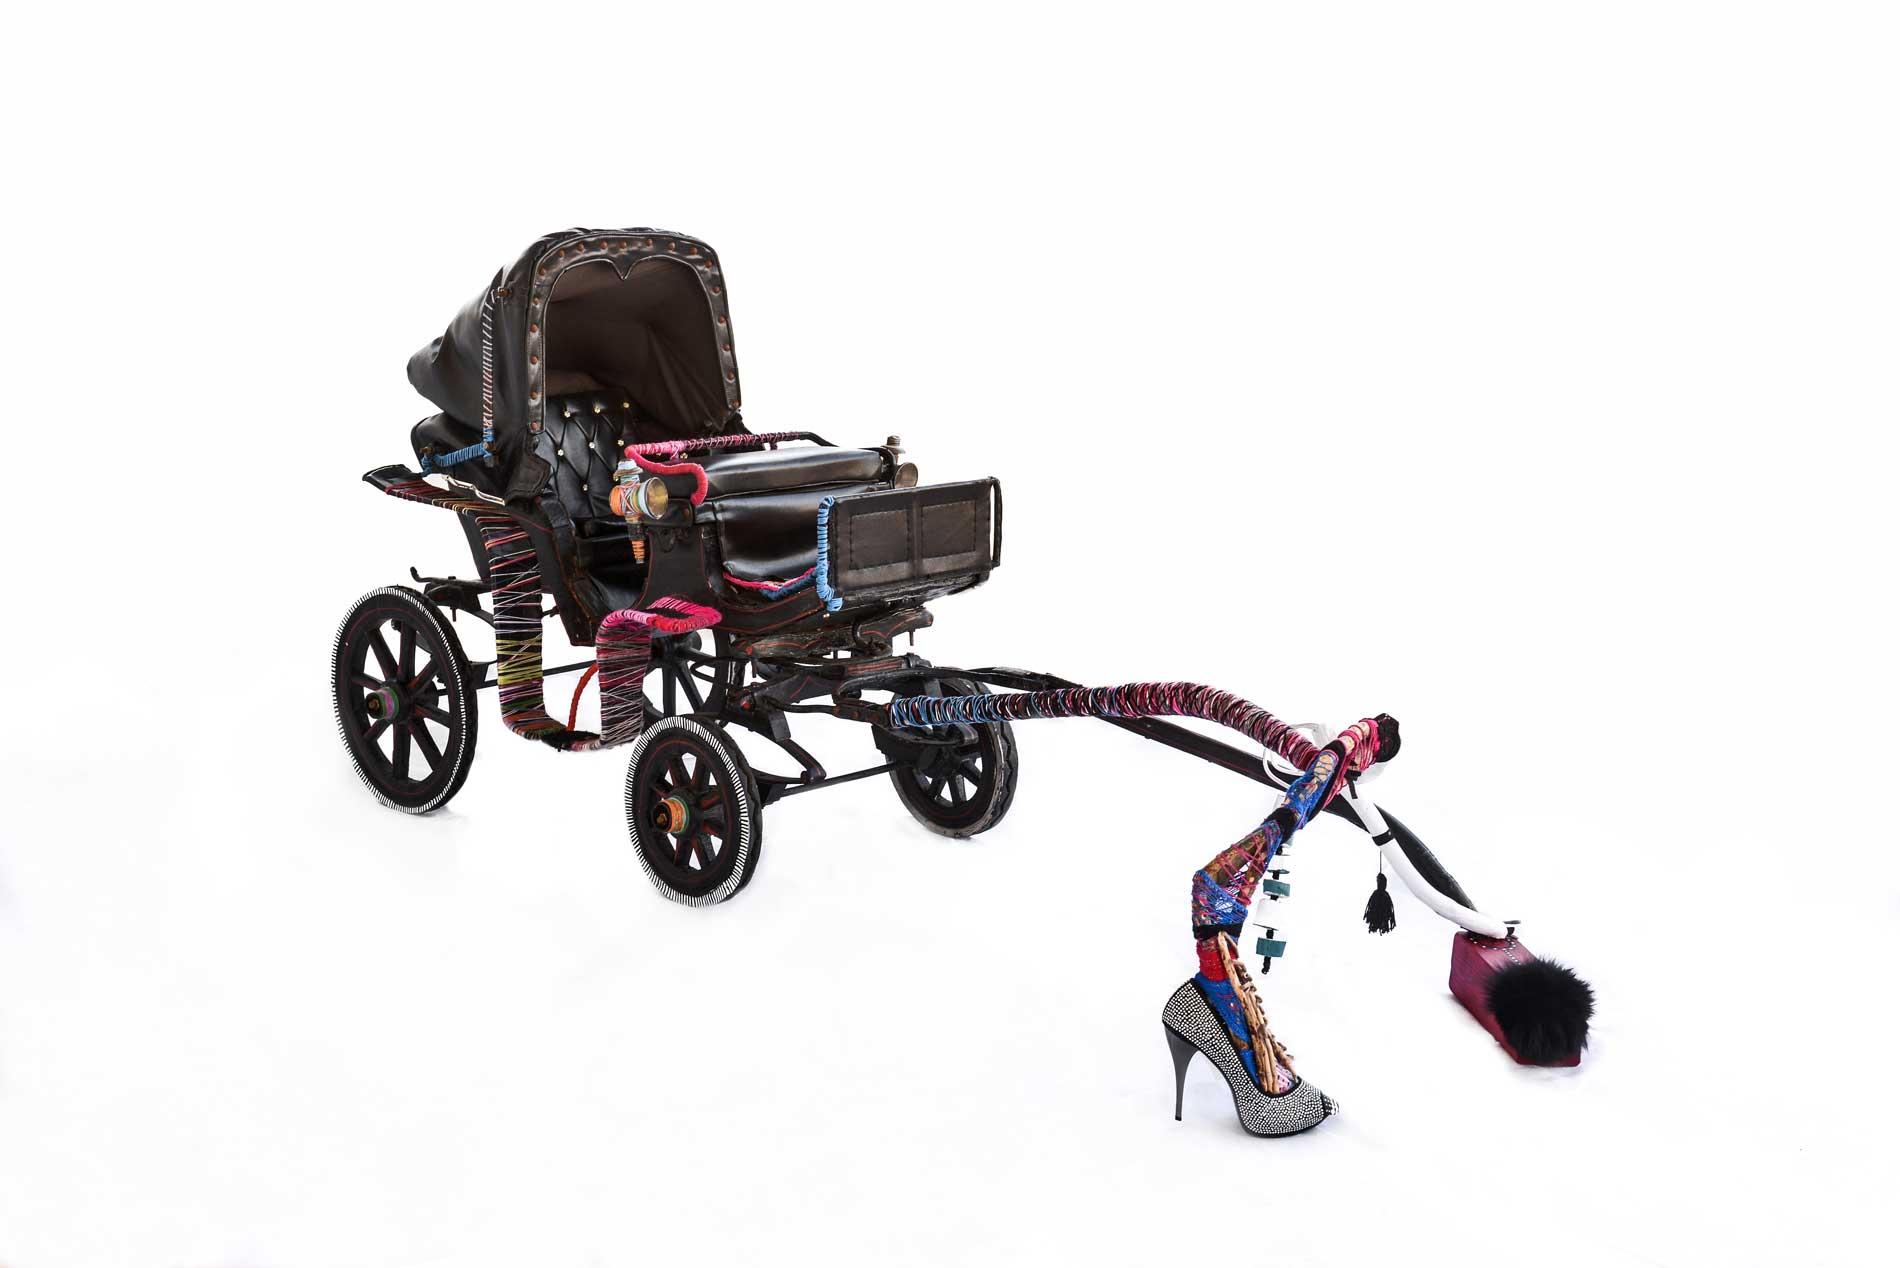 Ena - 110x70x210 cm - leather pony carriage, wood, stripper's shoe, metal, rabbit fur